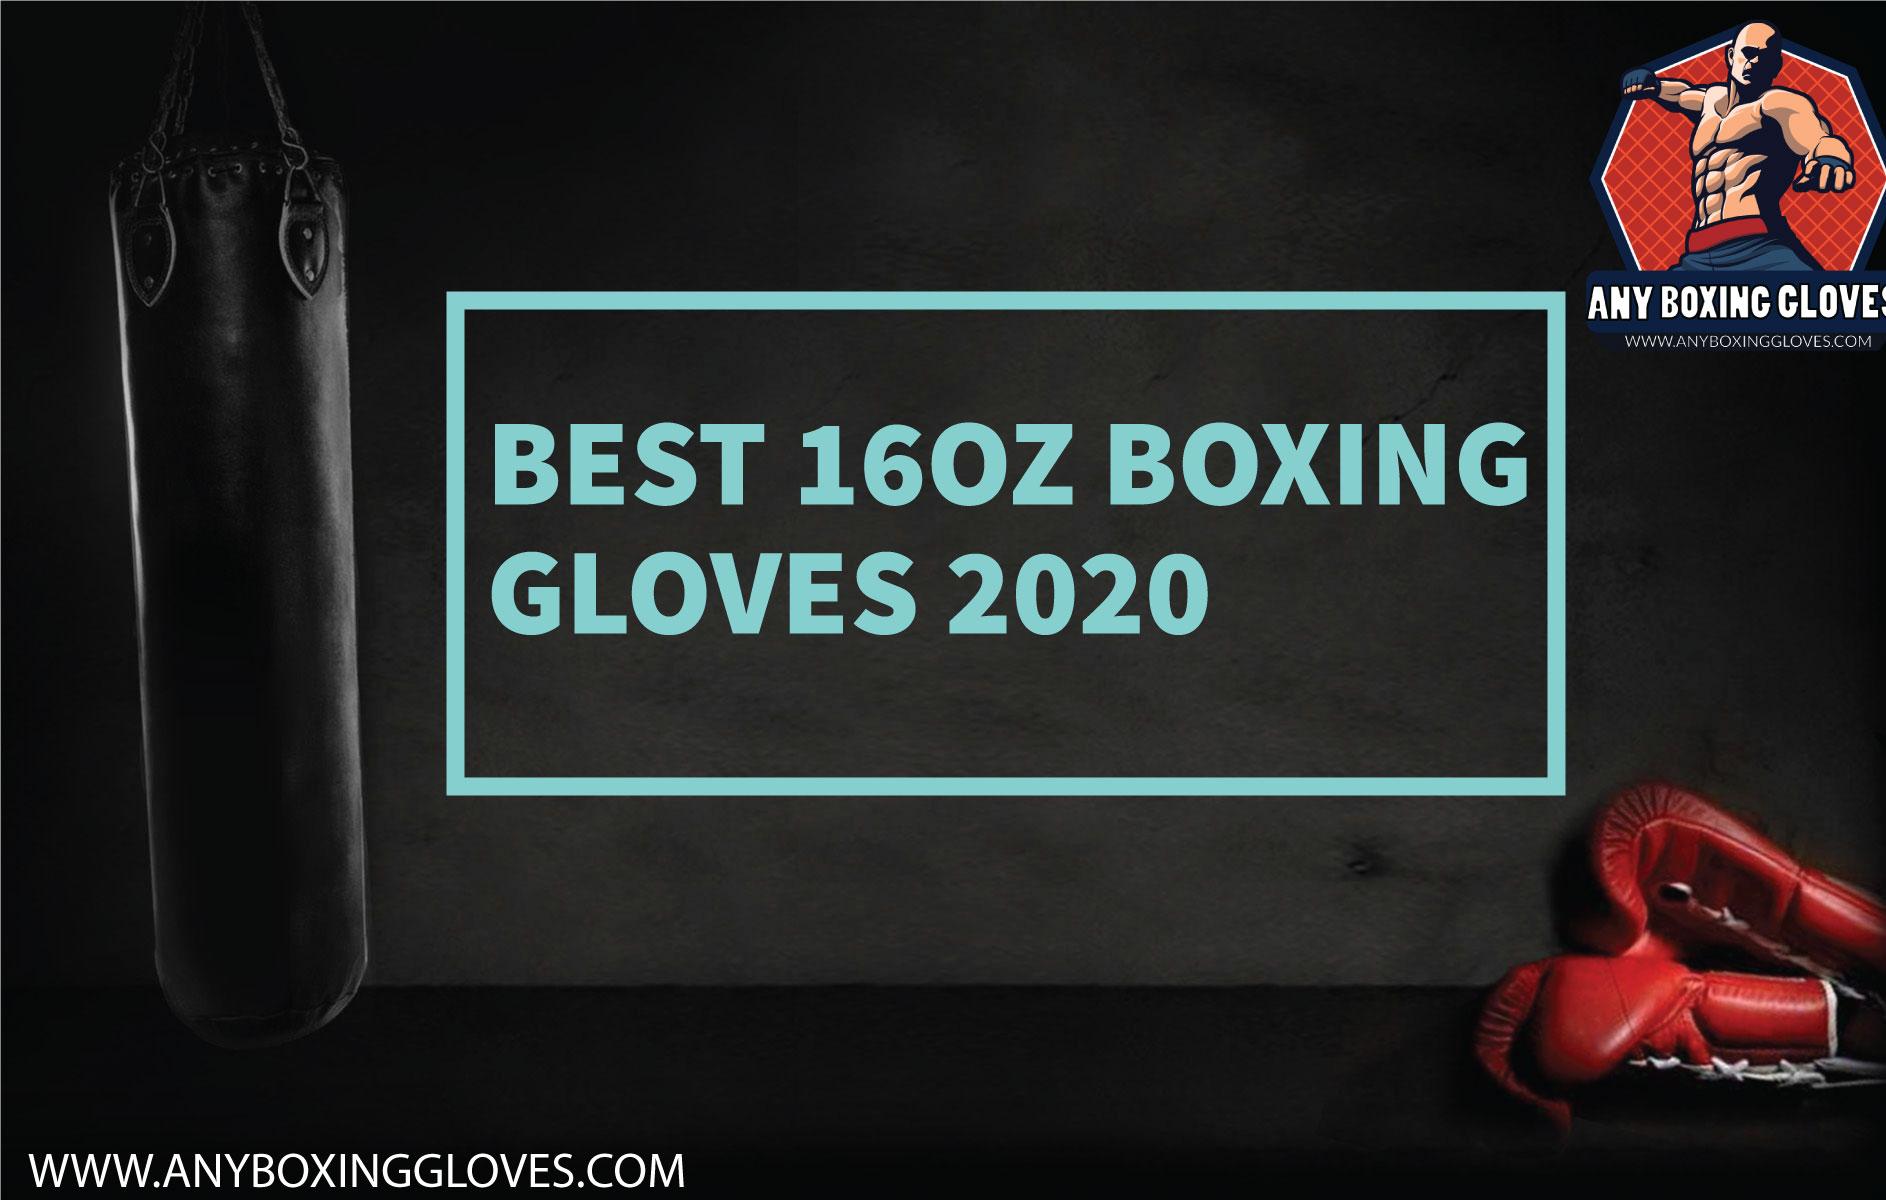 BEST 16oz BOXING GLOVES